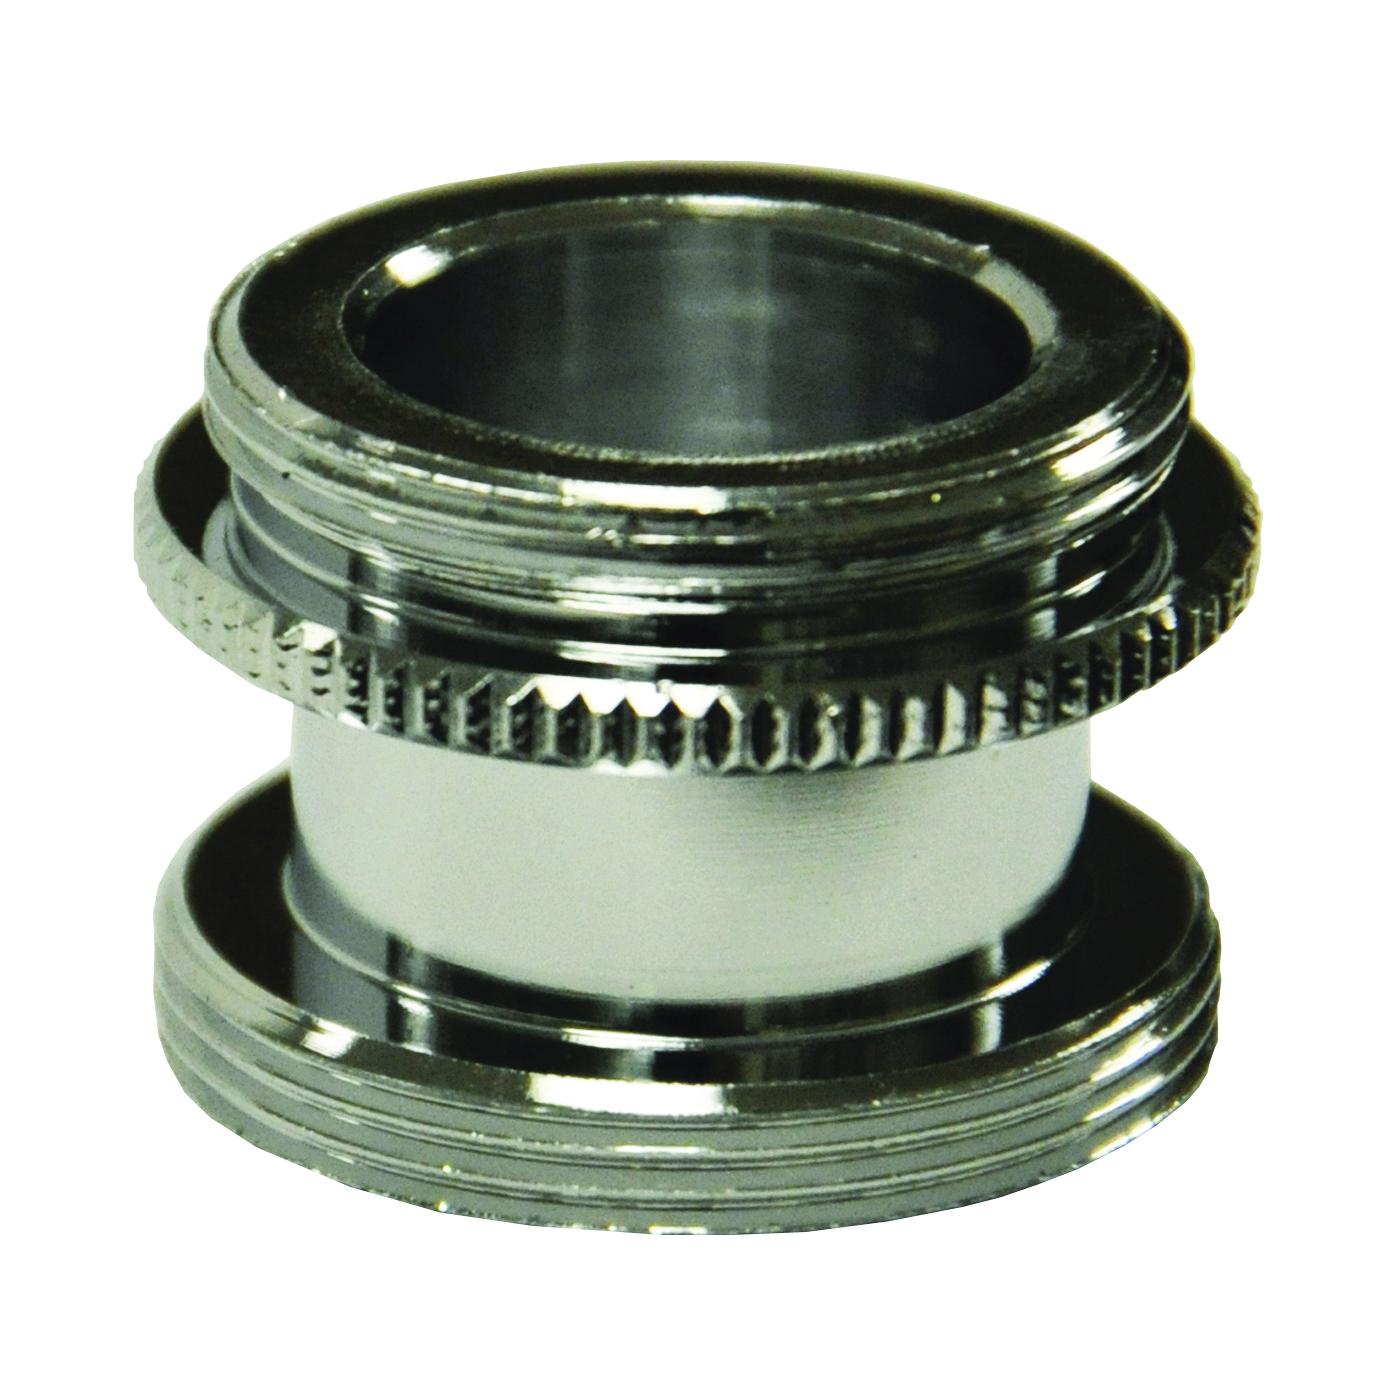 Picture of Danco 10517 Aerator Adapter, 15/16-27 x 55/64-27 in, Male, Brass, Chrome